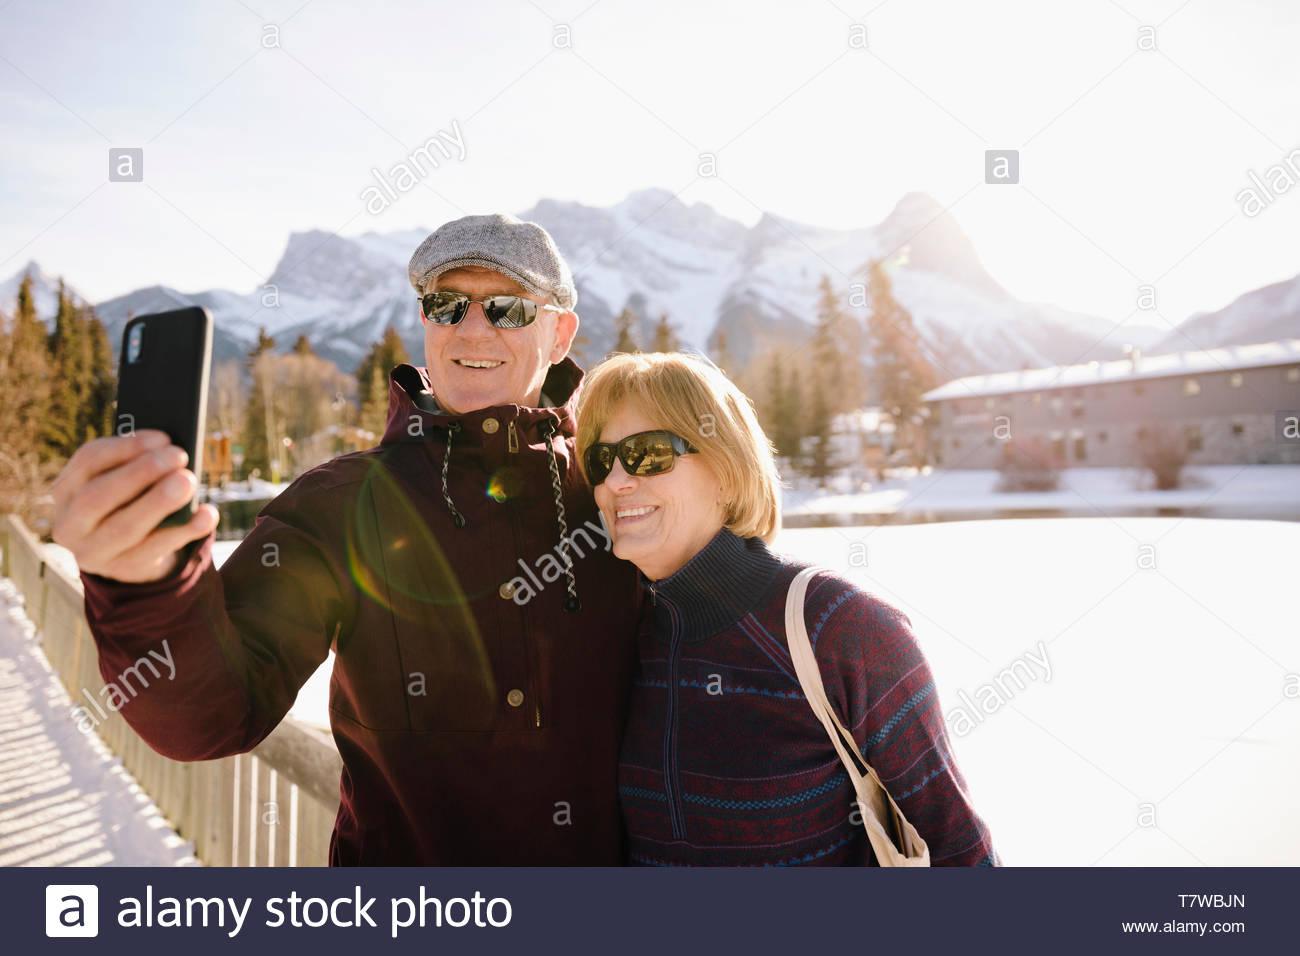 Smiling senior couple taking selfie on frozen pond Stock Photo